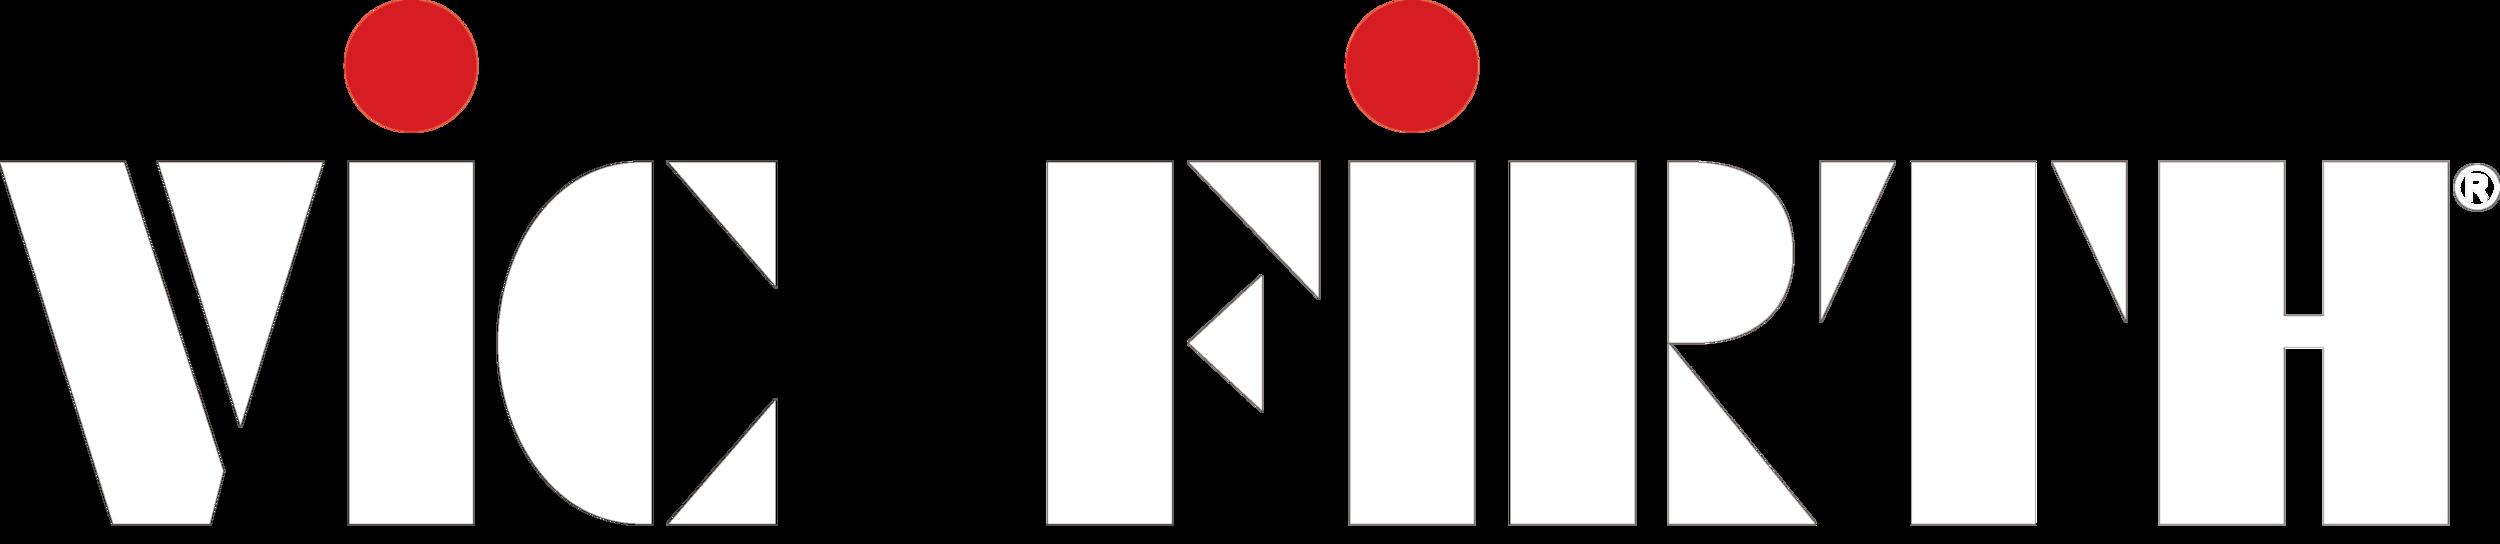 vf_logo_white.png